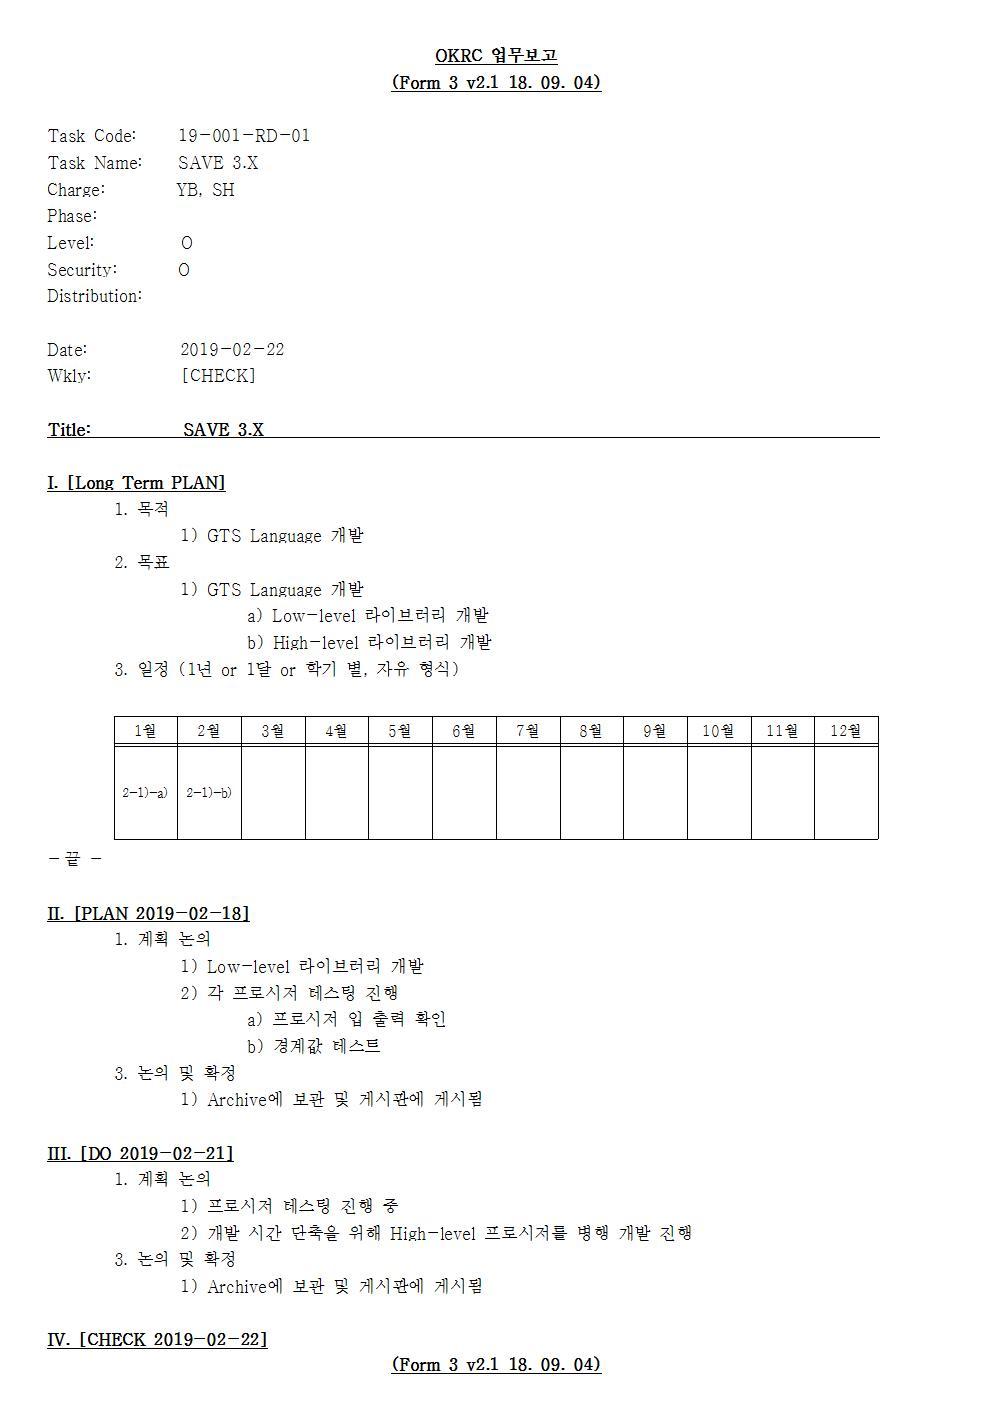 D-[19-001-RD-01]-[SAVE 3.X]-[2019-02-22][SH]001.jpg